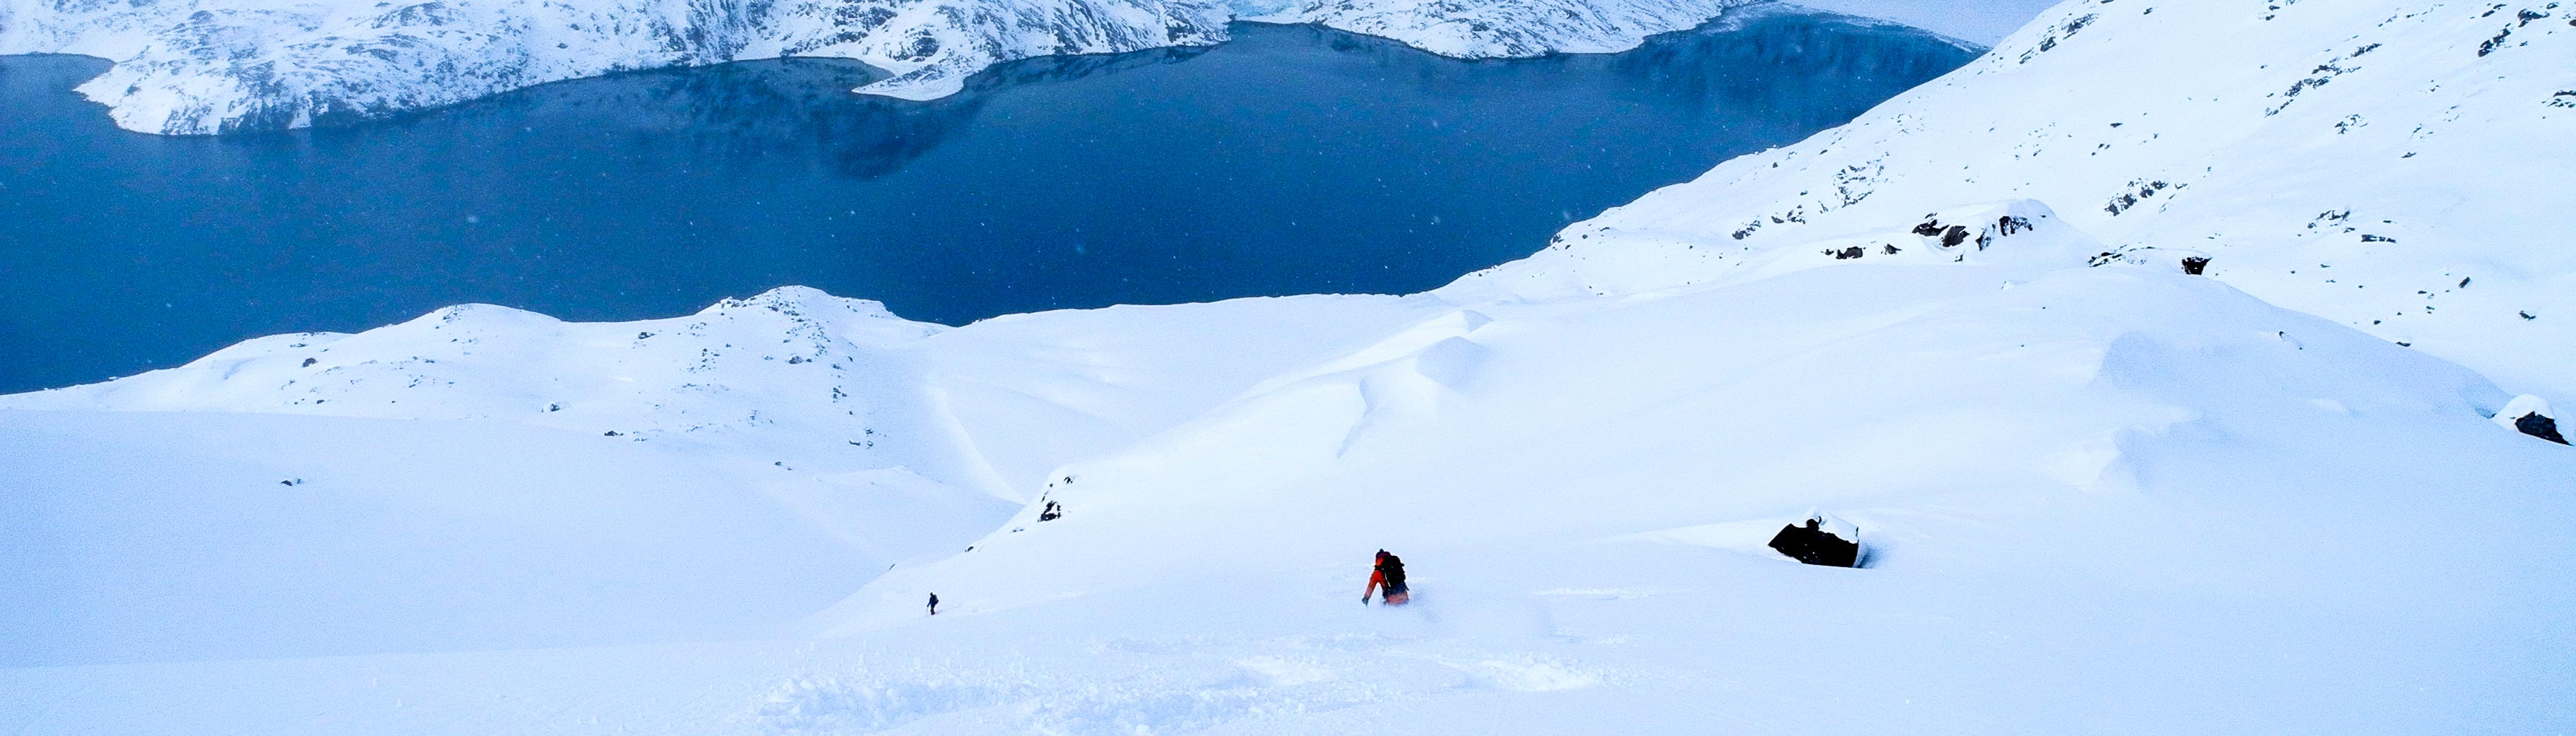 Skitouren Grönland, Greenland Skitouring